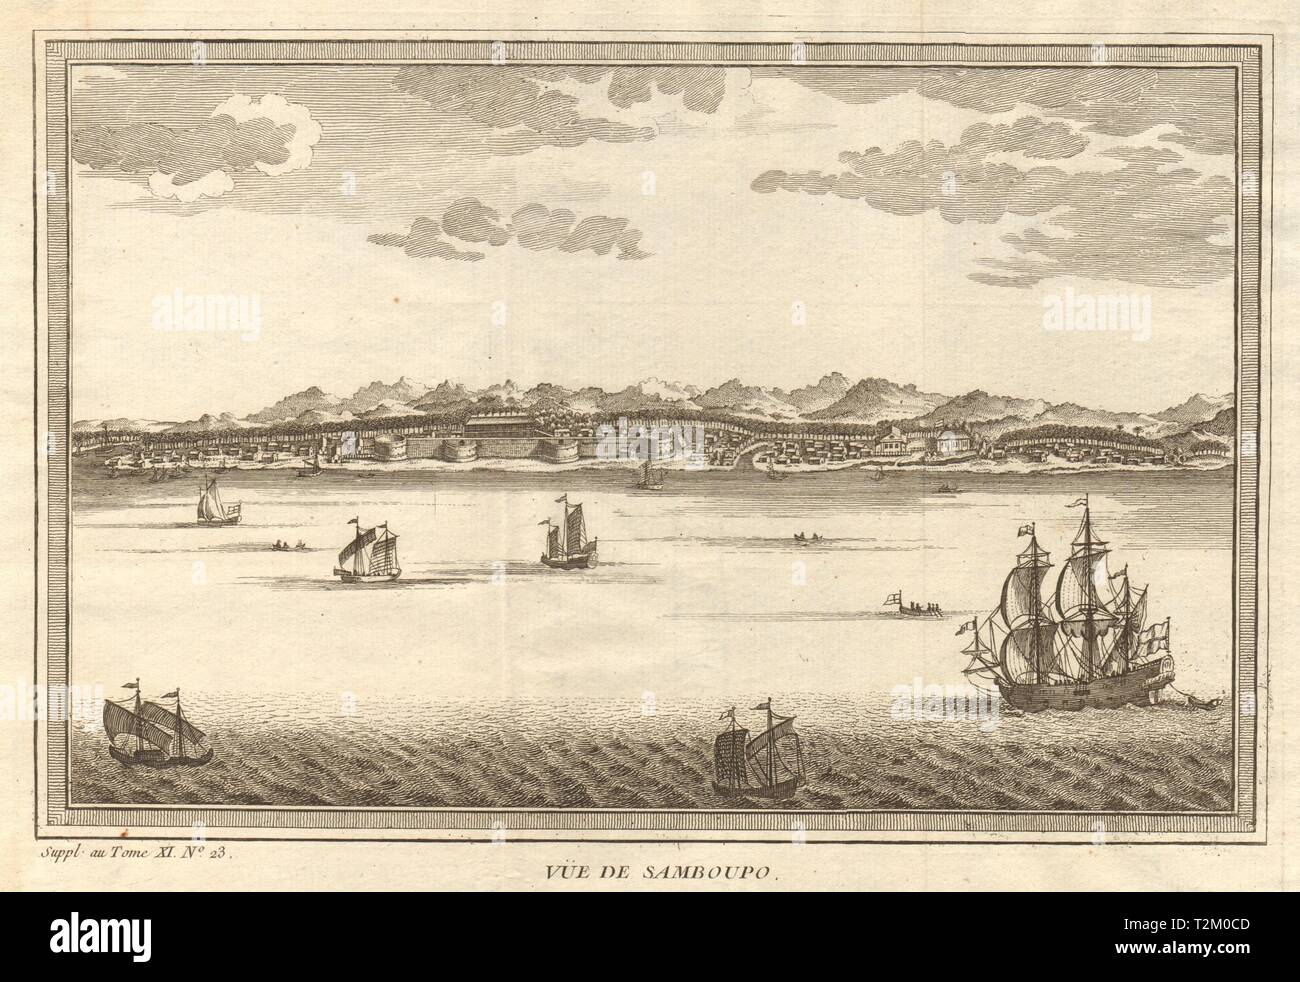 'Vue de Samboupo'. View of Makassar, Sulawesi, Indonesia. Celebes 1761 print - Stock Image